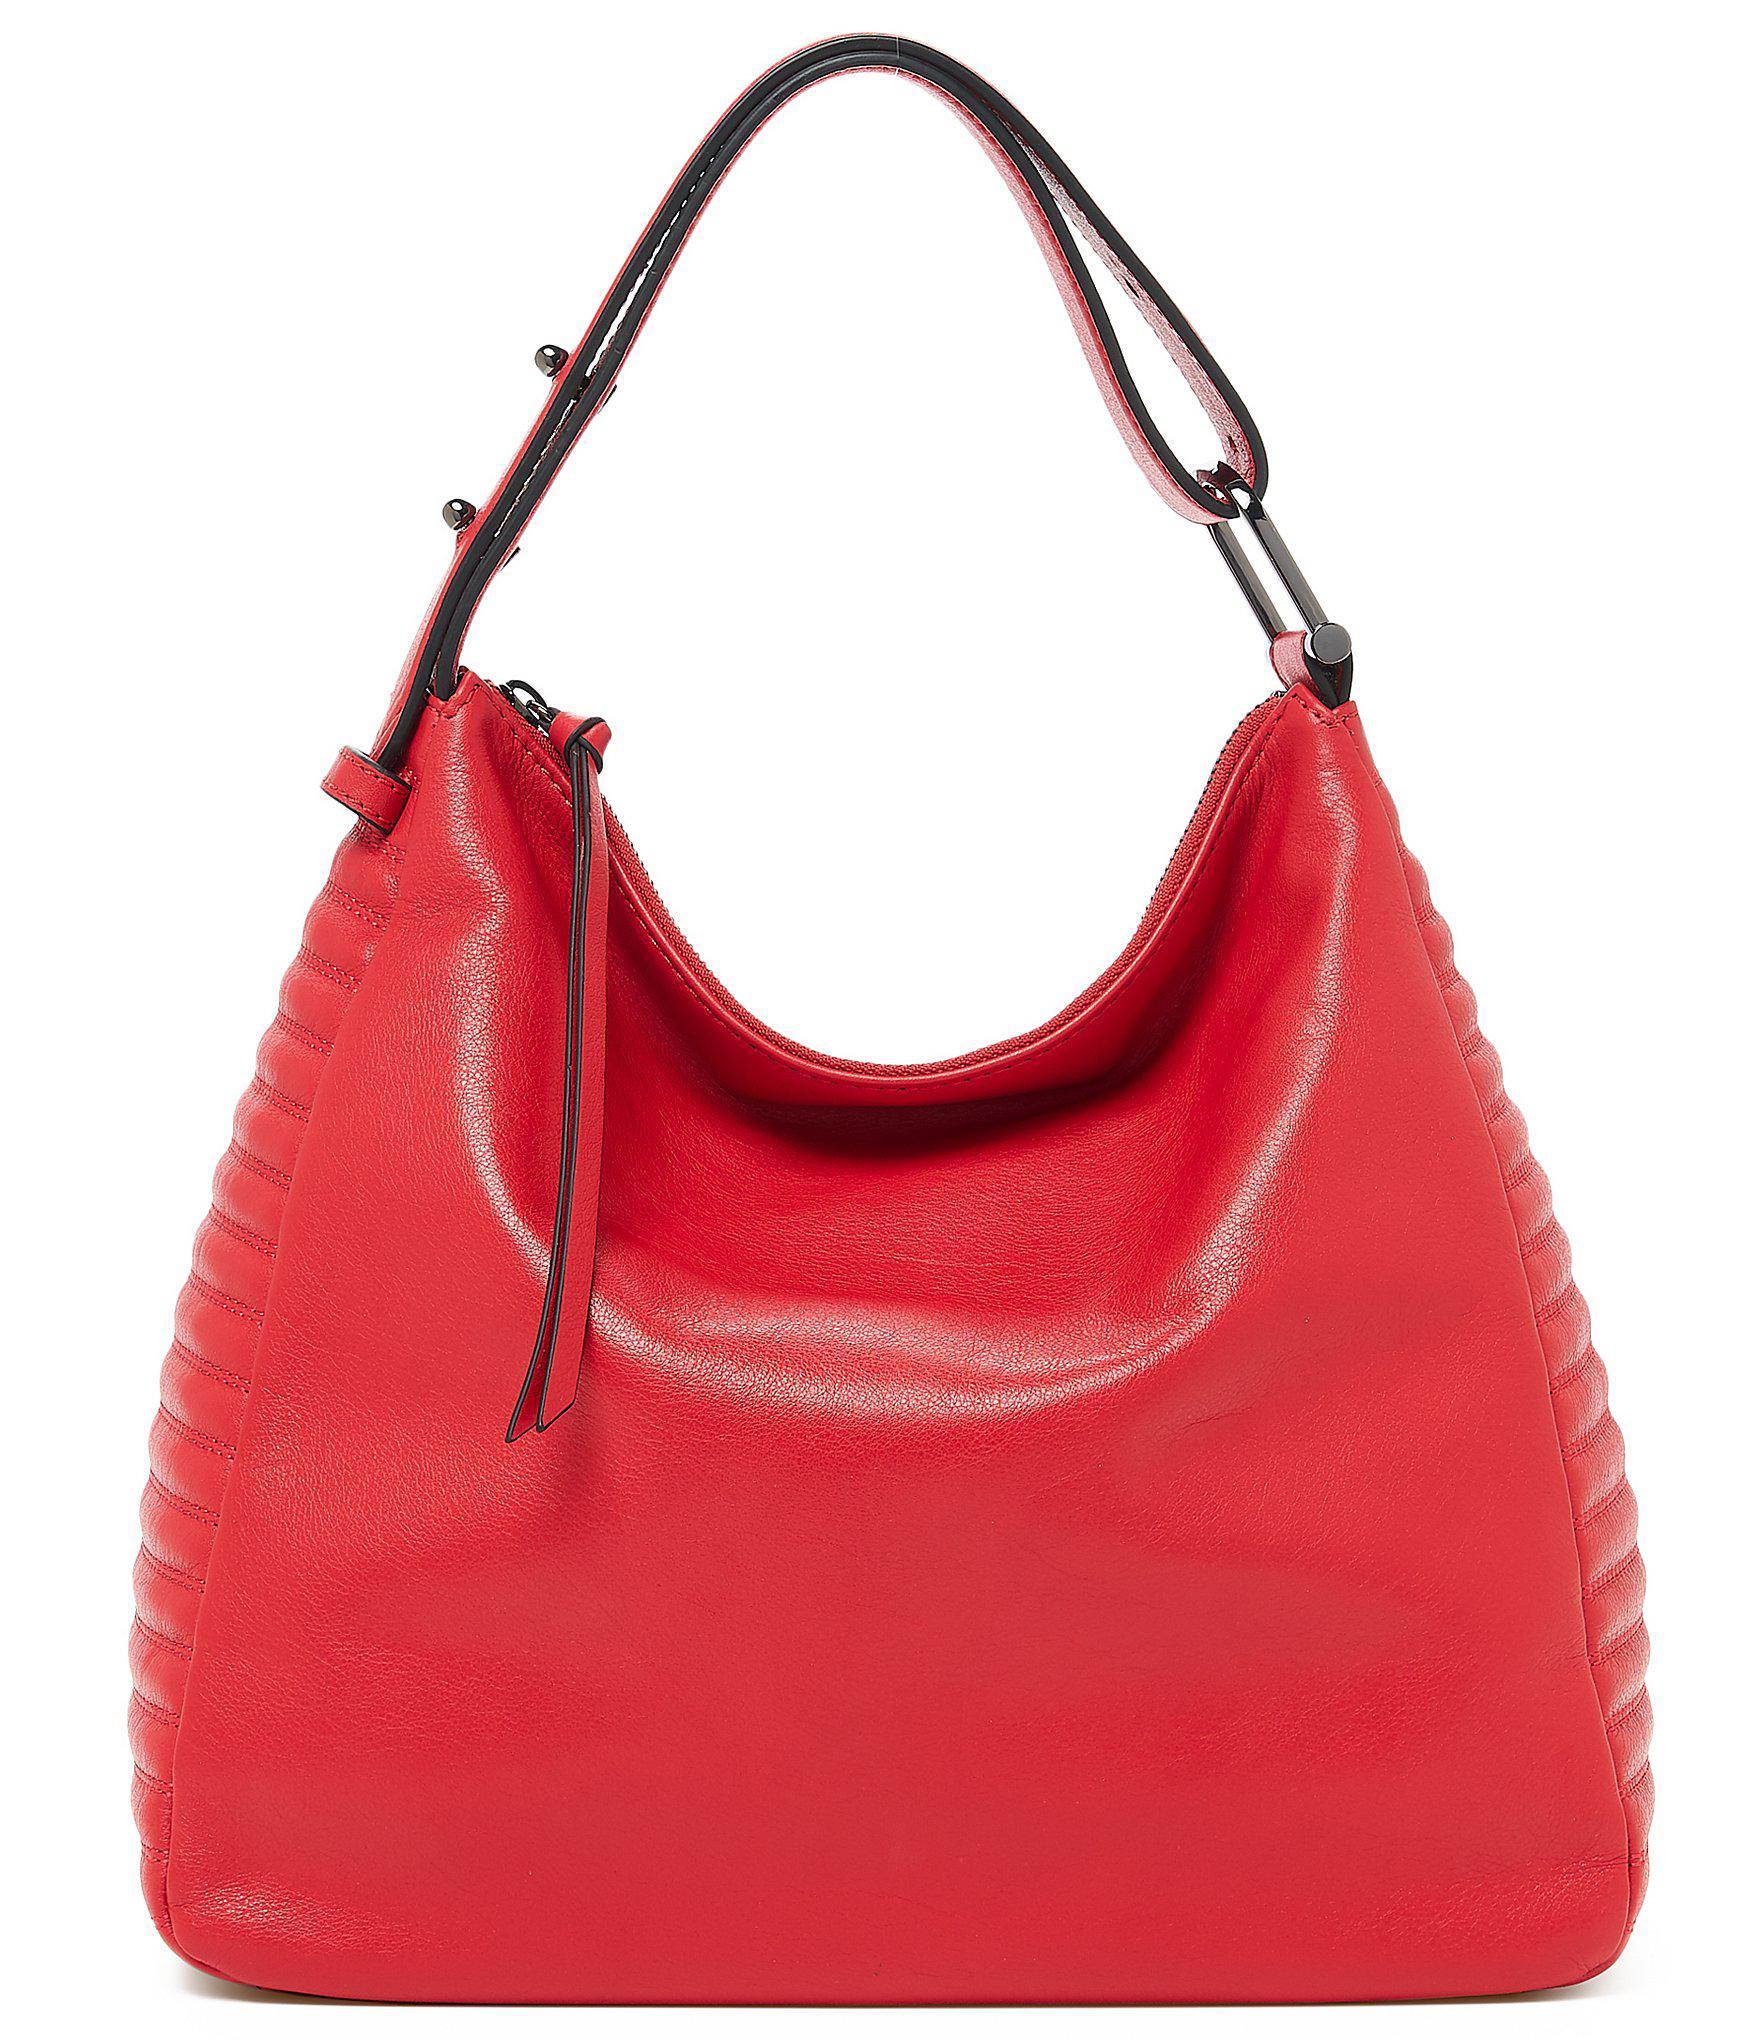 Botkier - Red Moto Top Zip Hobo Bag - Lyst. View fullscreen df7f6b9eb8974